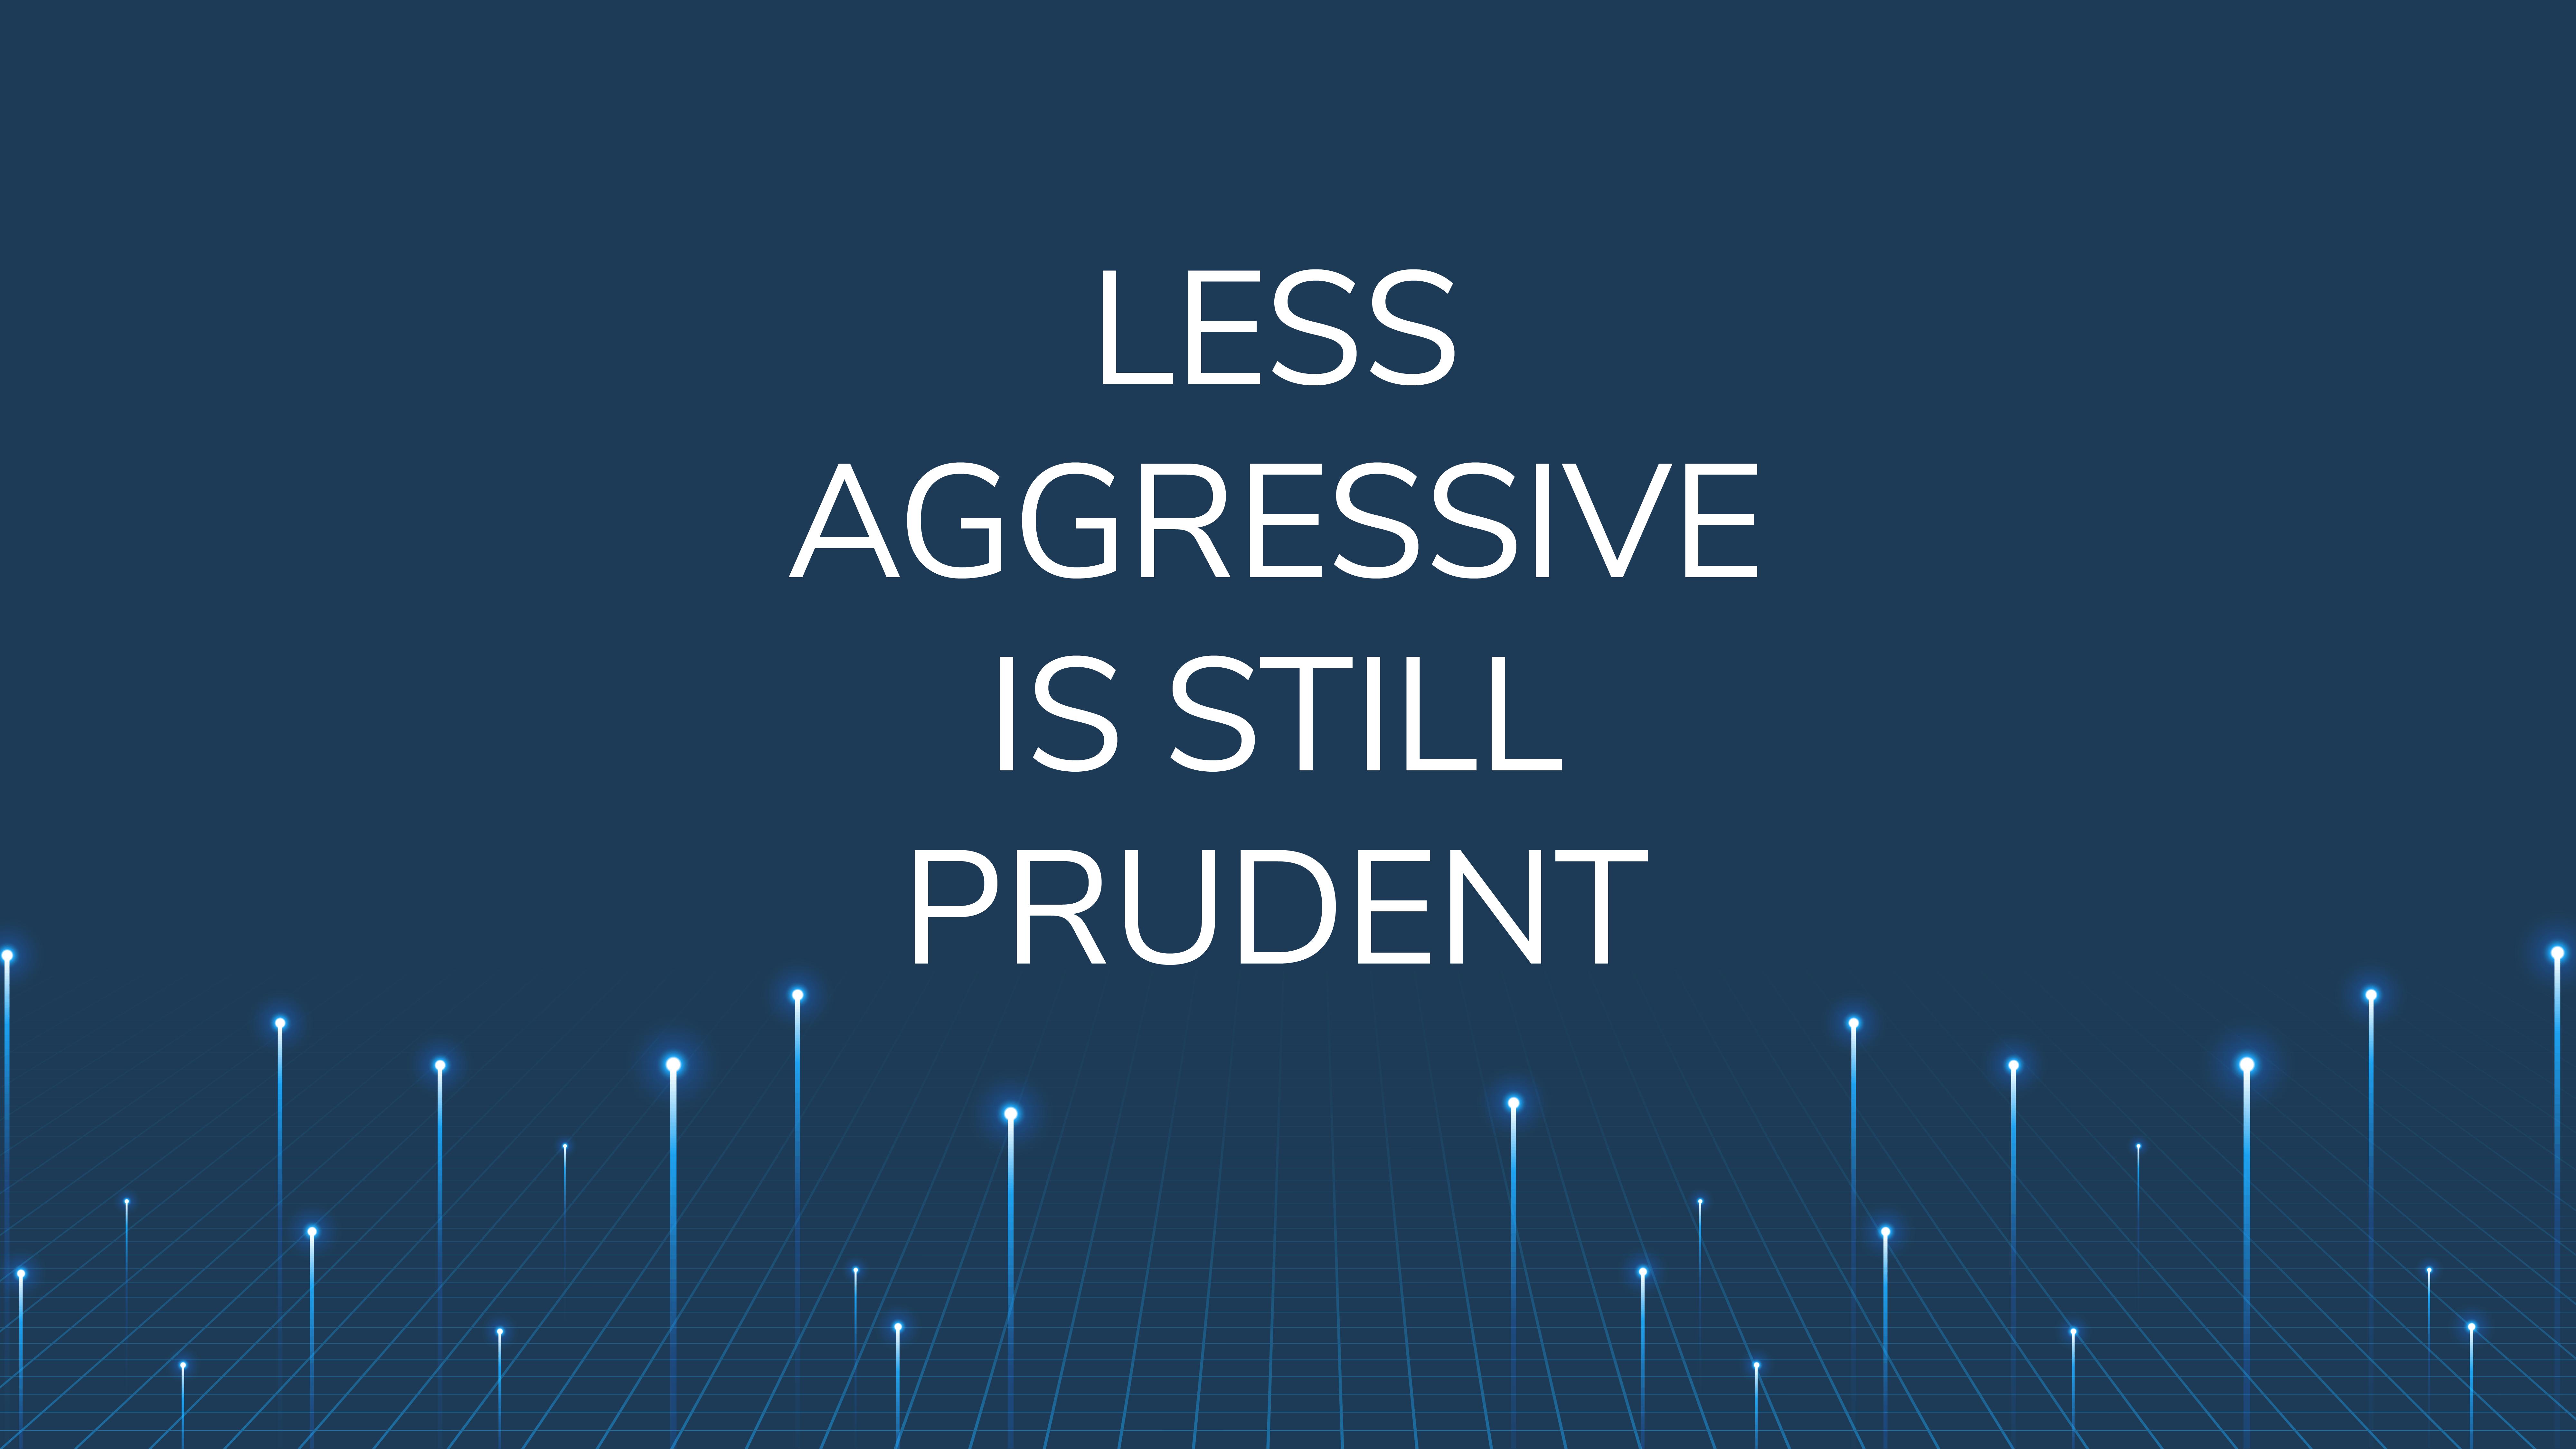 Less Aggressive  is Still Prudent